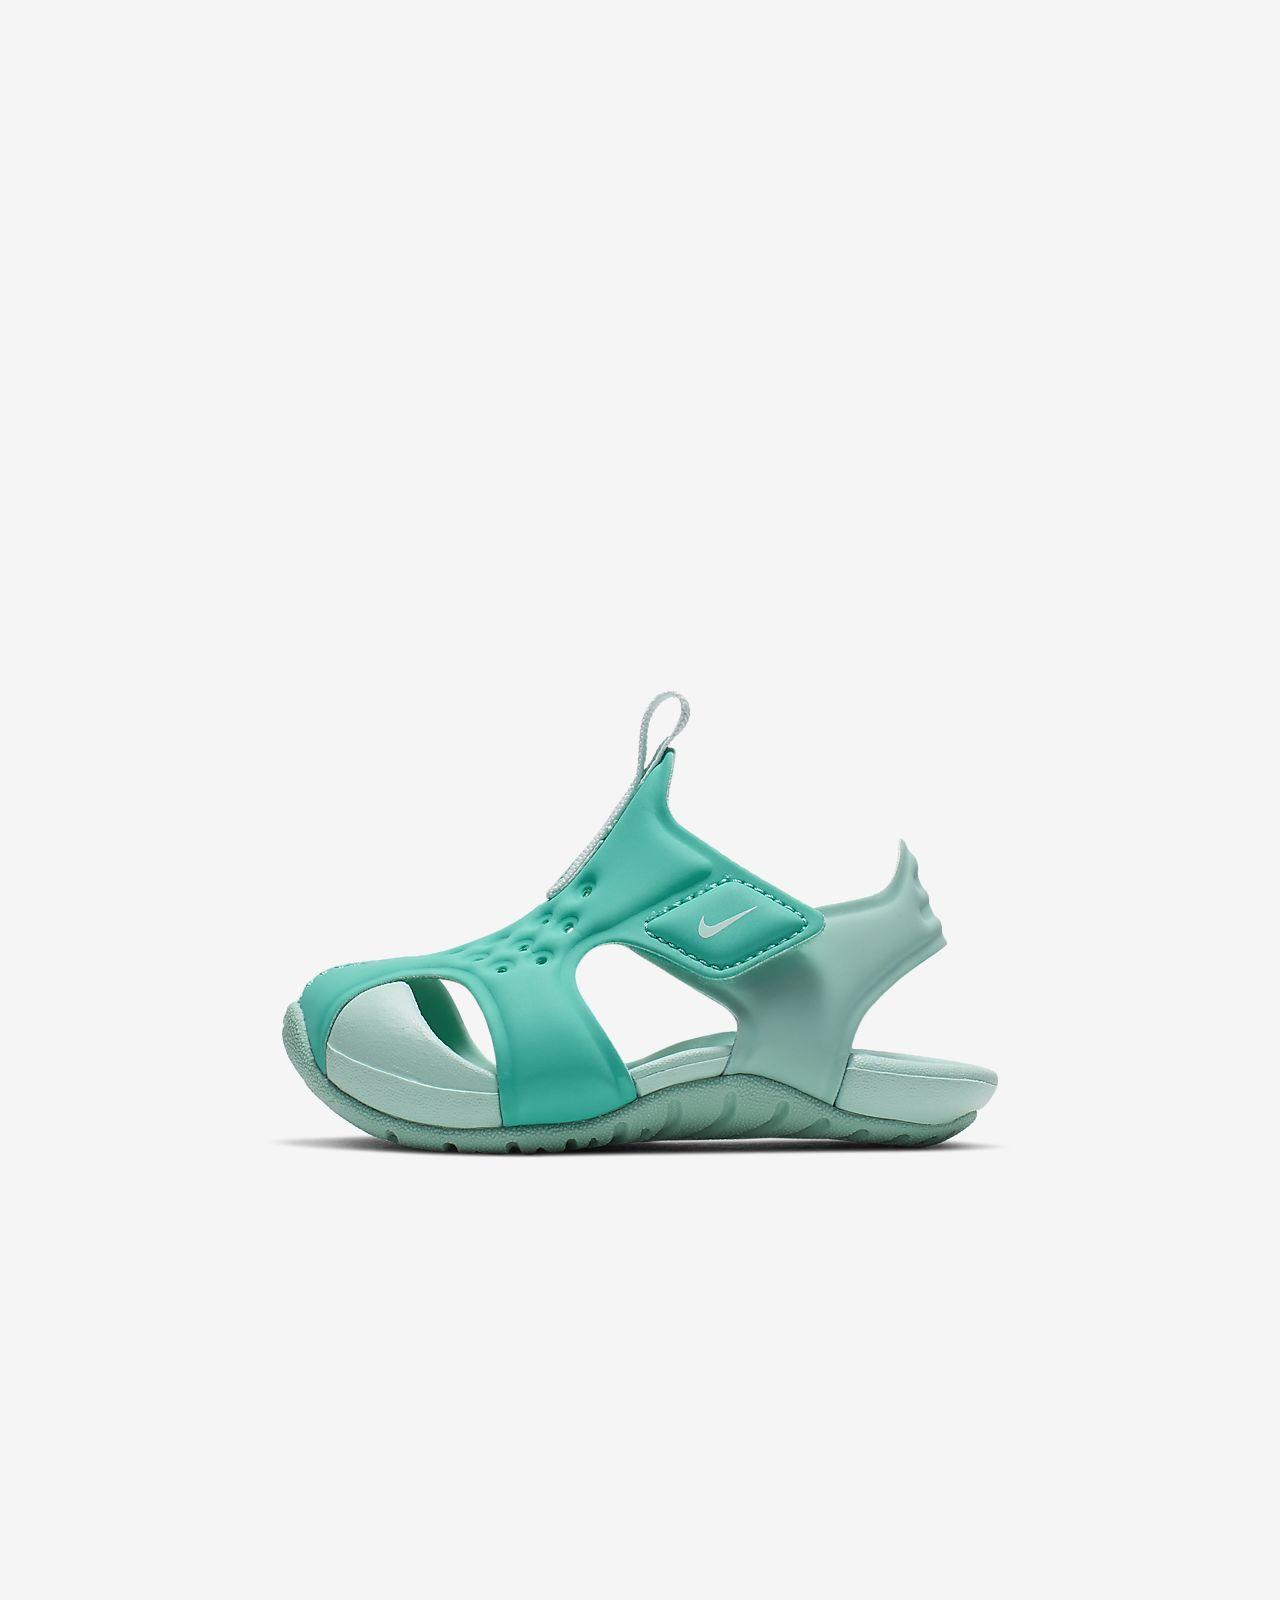 6f8edff98 Sandalia Nike Sunray Protect 2 para bebés / niños pequeños. Nike.com MX